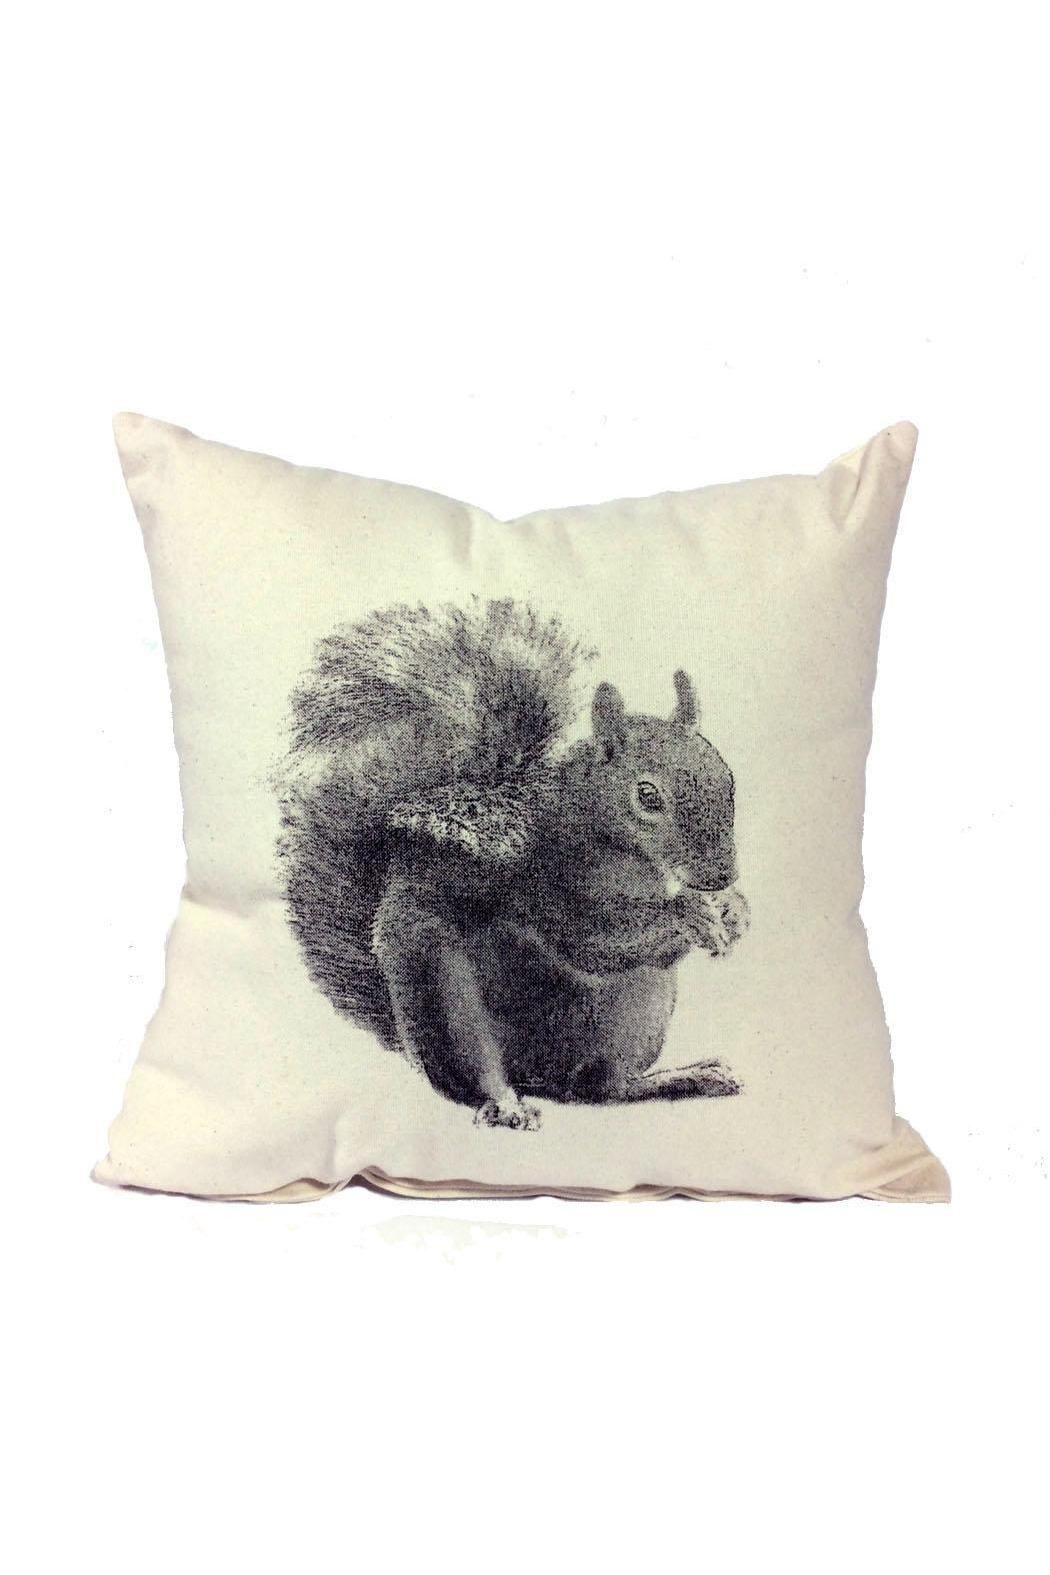 Squirrel Pillow Medium Pillows Squirrel Throw Pillows